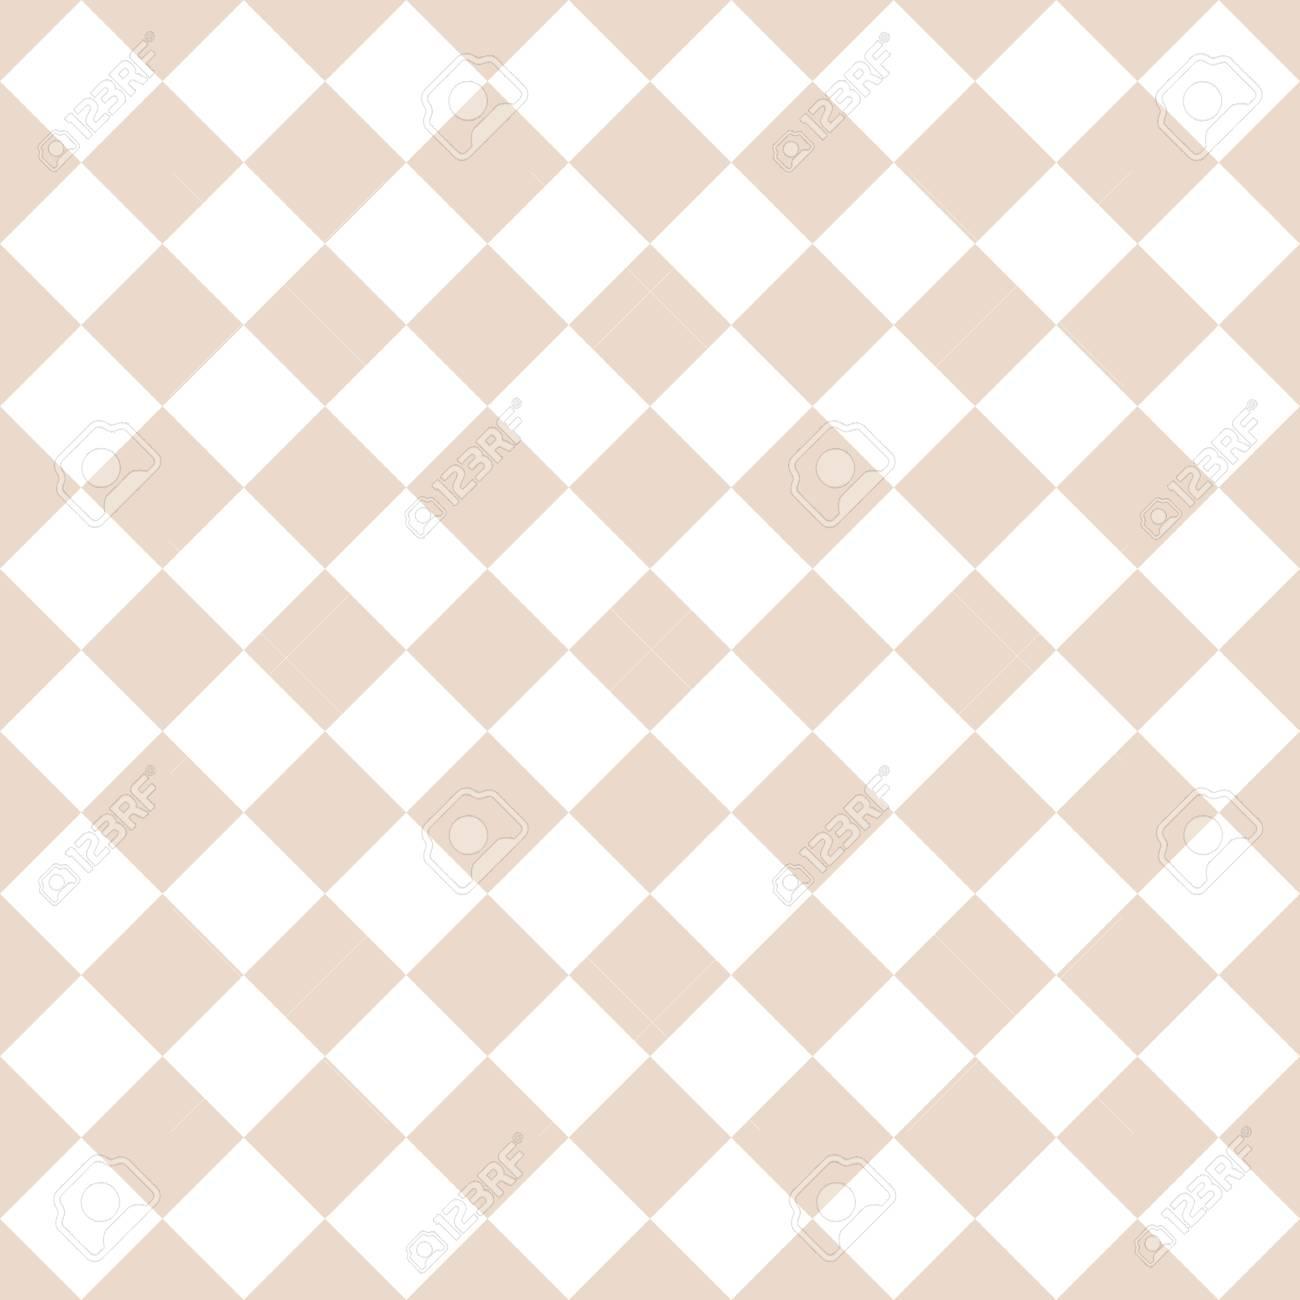 Abstract Simple Tile Rhombus Pattern. Almond Or Tender Pastel ...